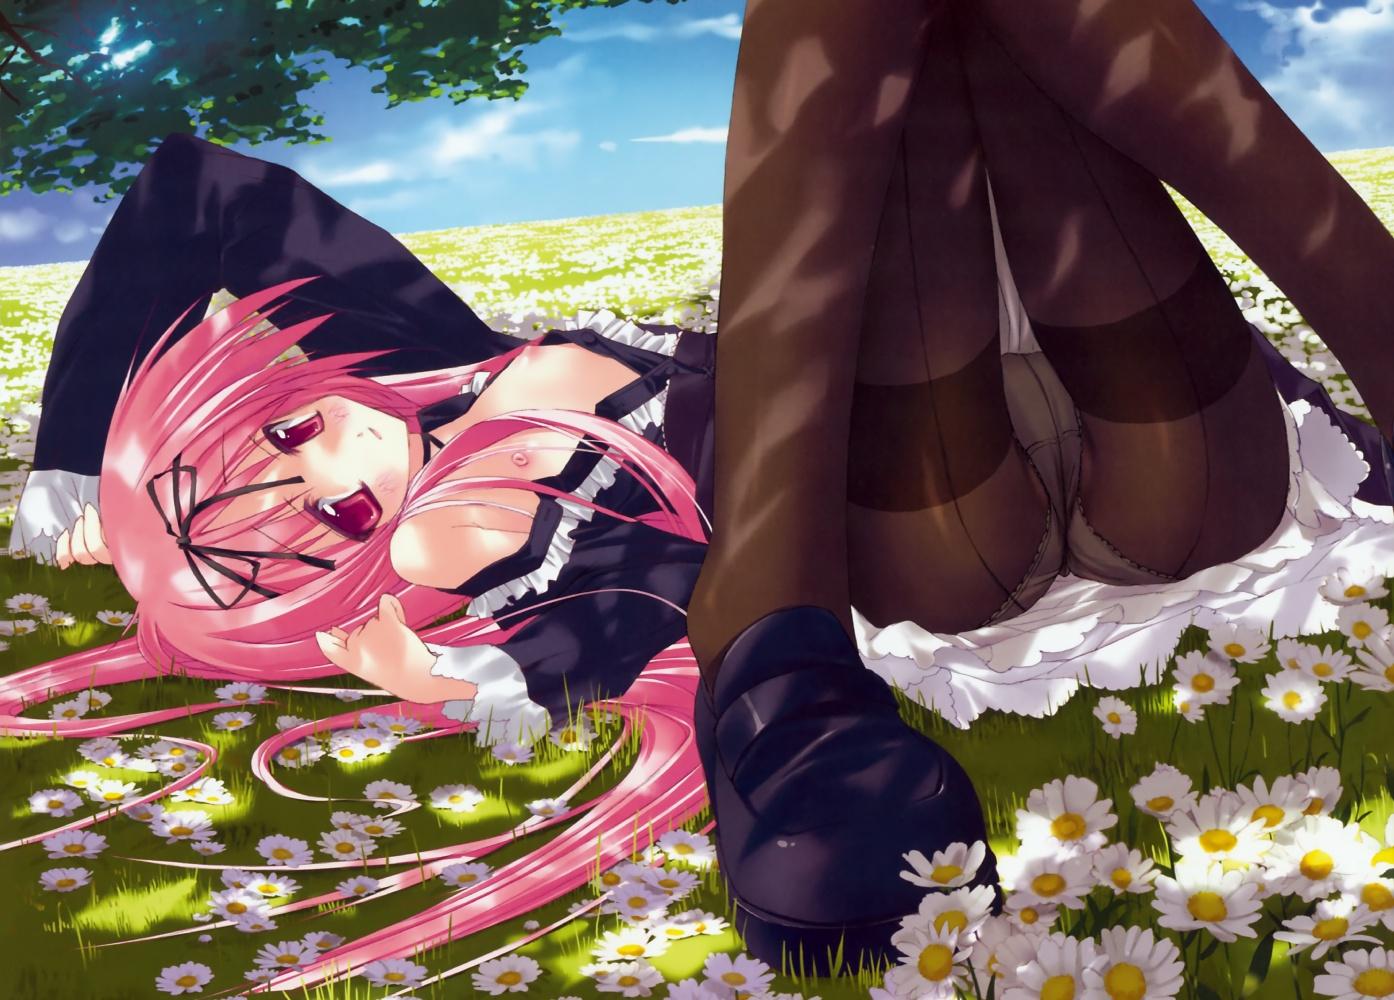 breasts garden_(galge) himemiya_ruri nipples open_shirt panties pantyhose pink_hair skirt sumaki_shungo underwear upskirt